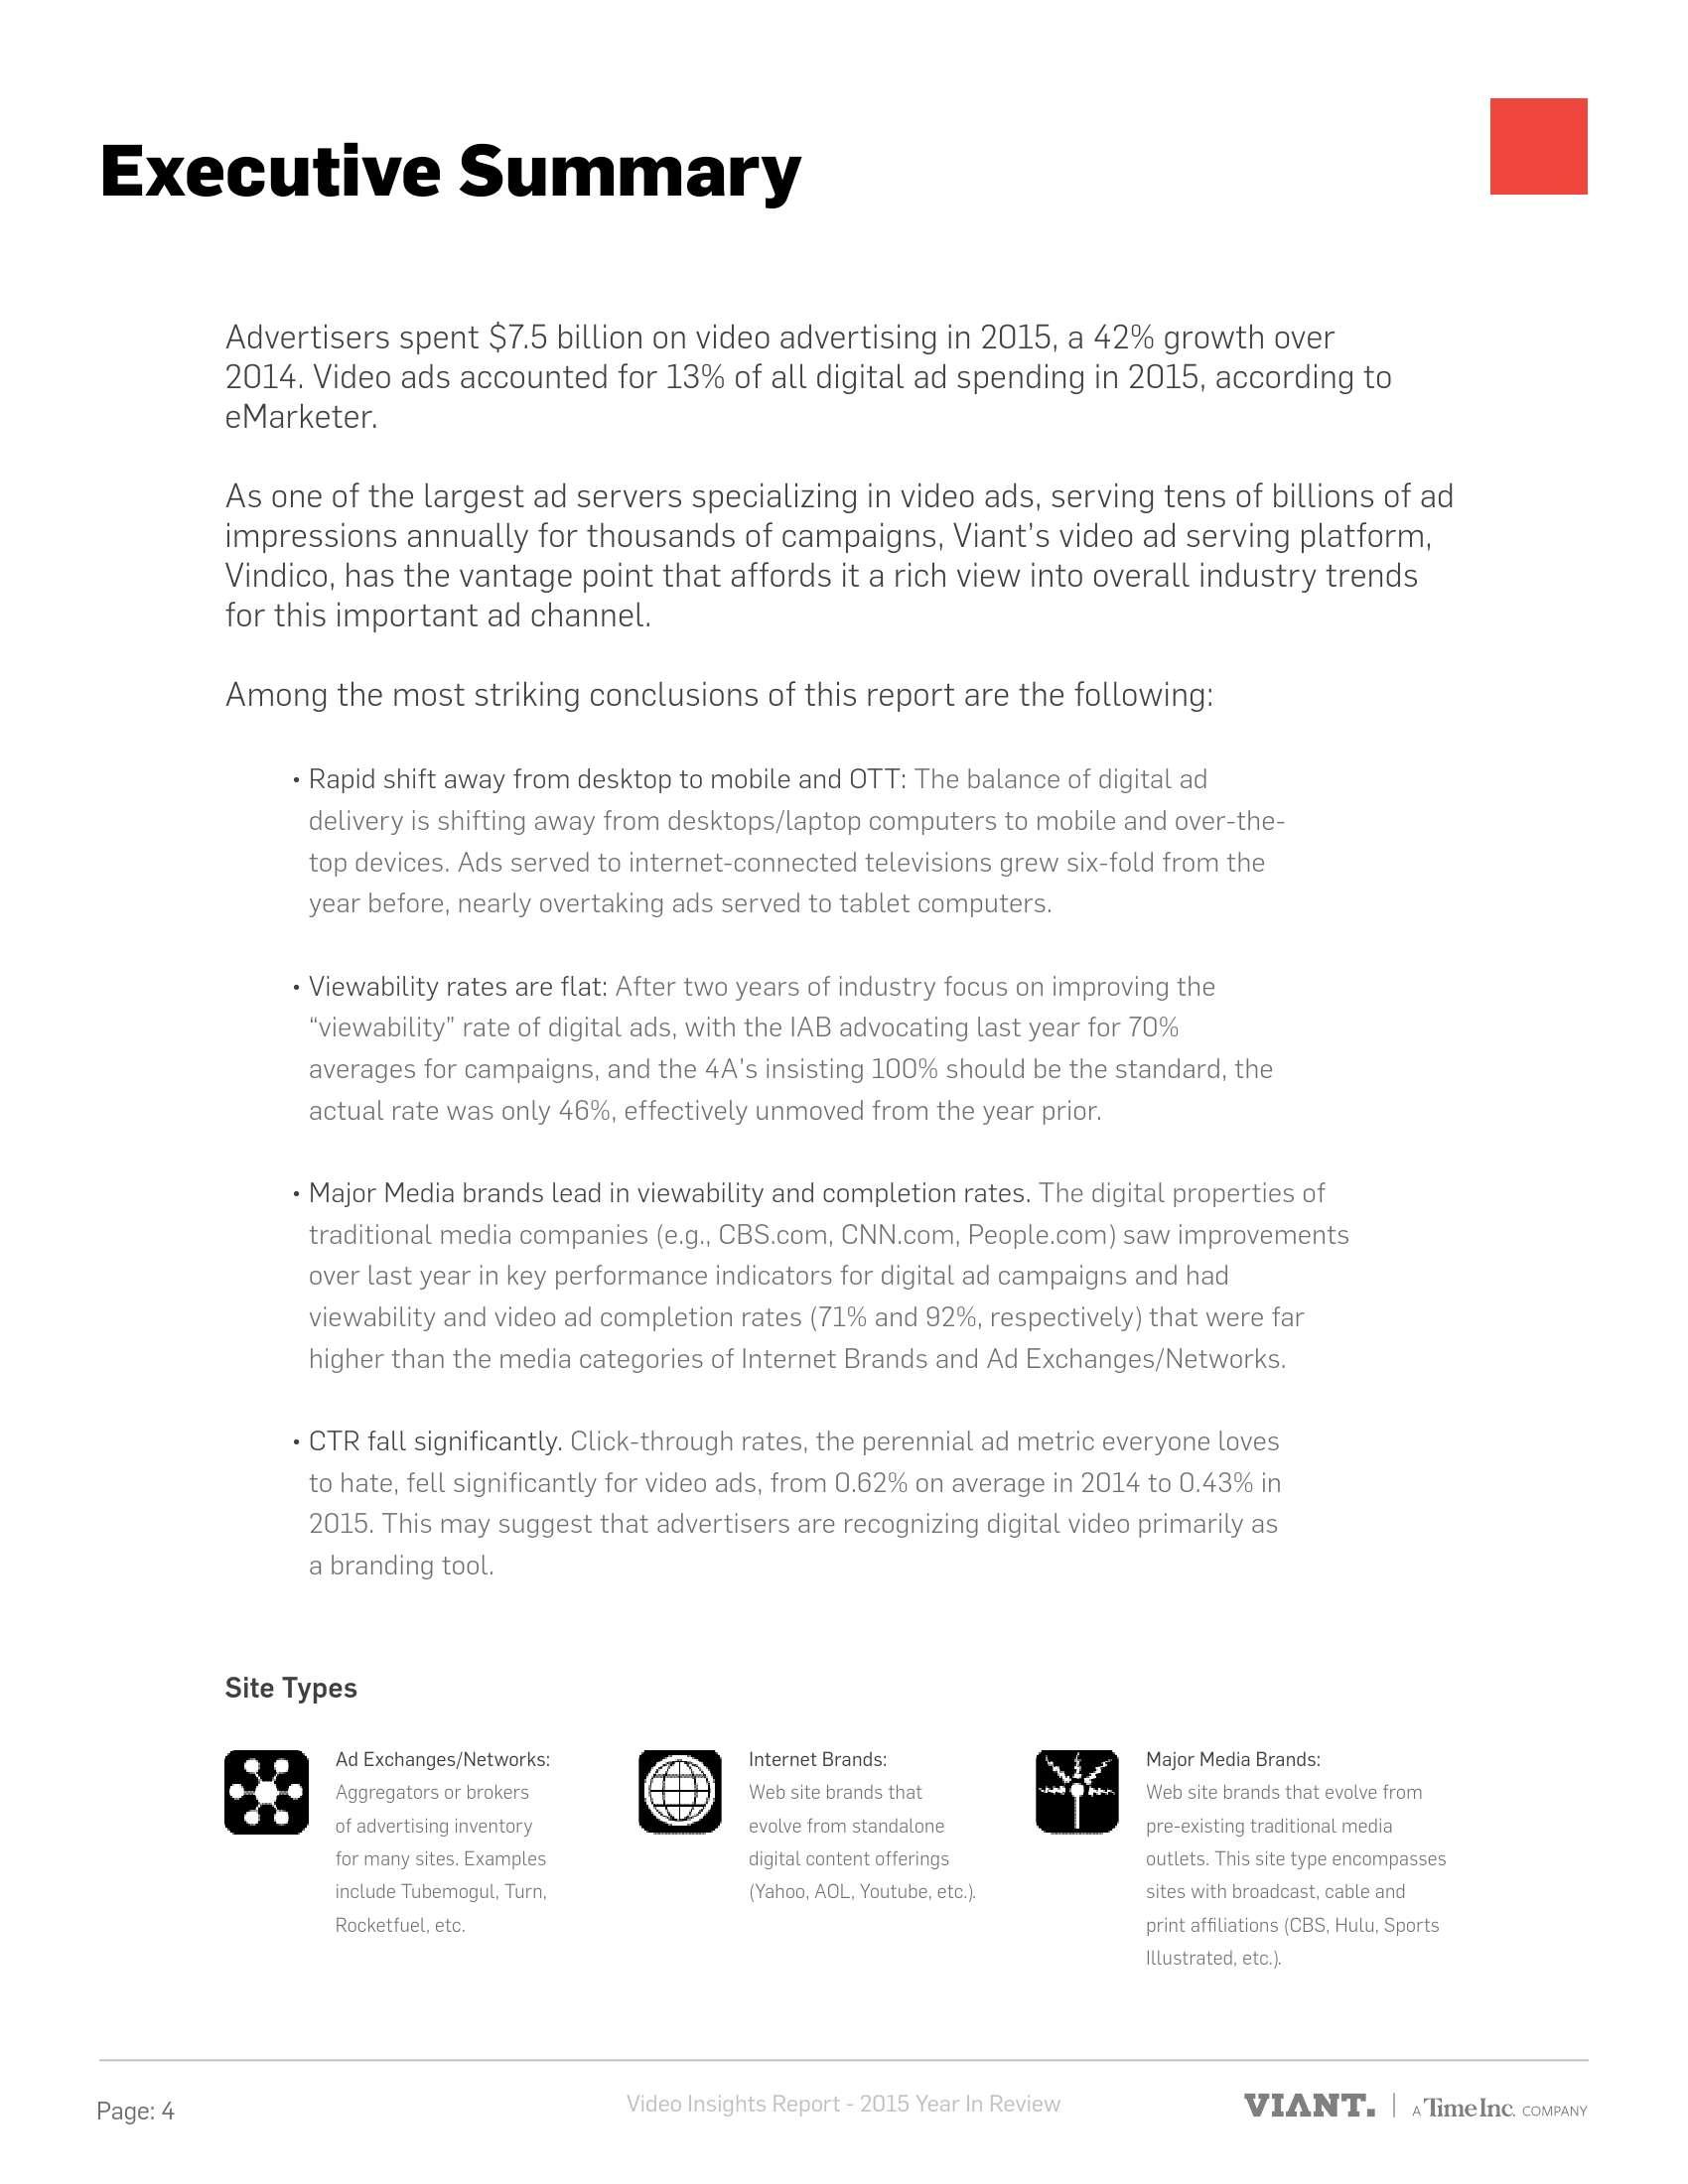 Viant:2015年视频广告趋势分析报告_000004